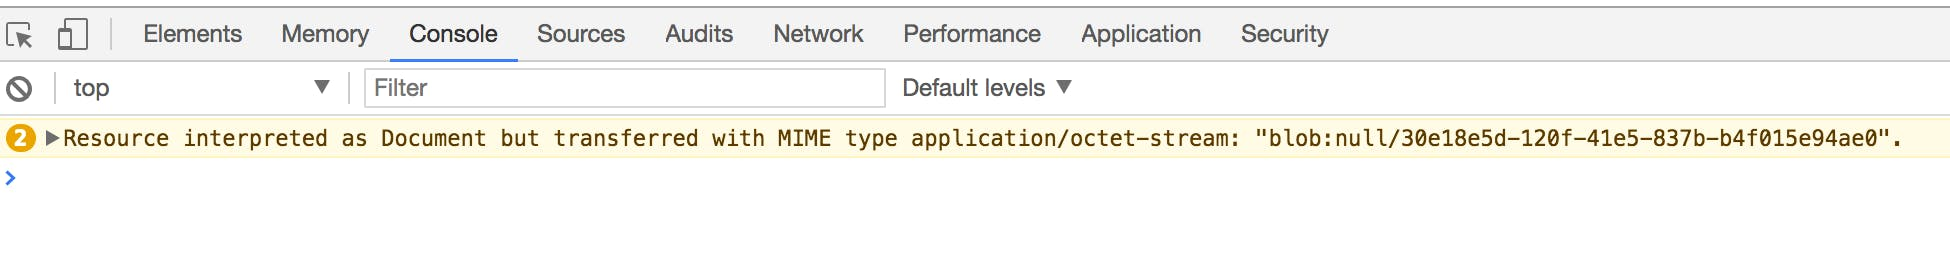 JavaScriptで動的に作成したテキストファイルをダウンロード - Qiita